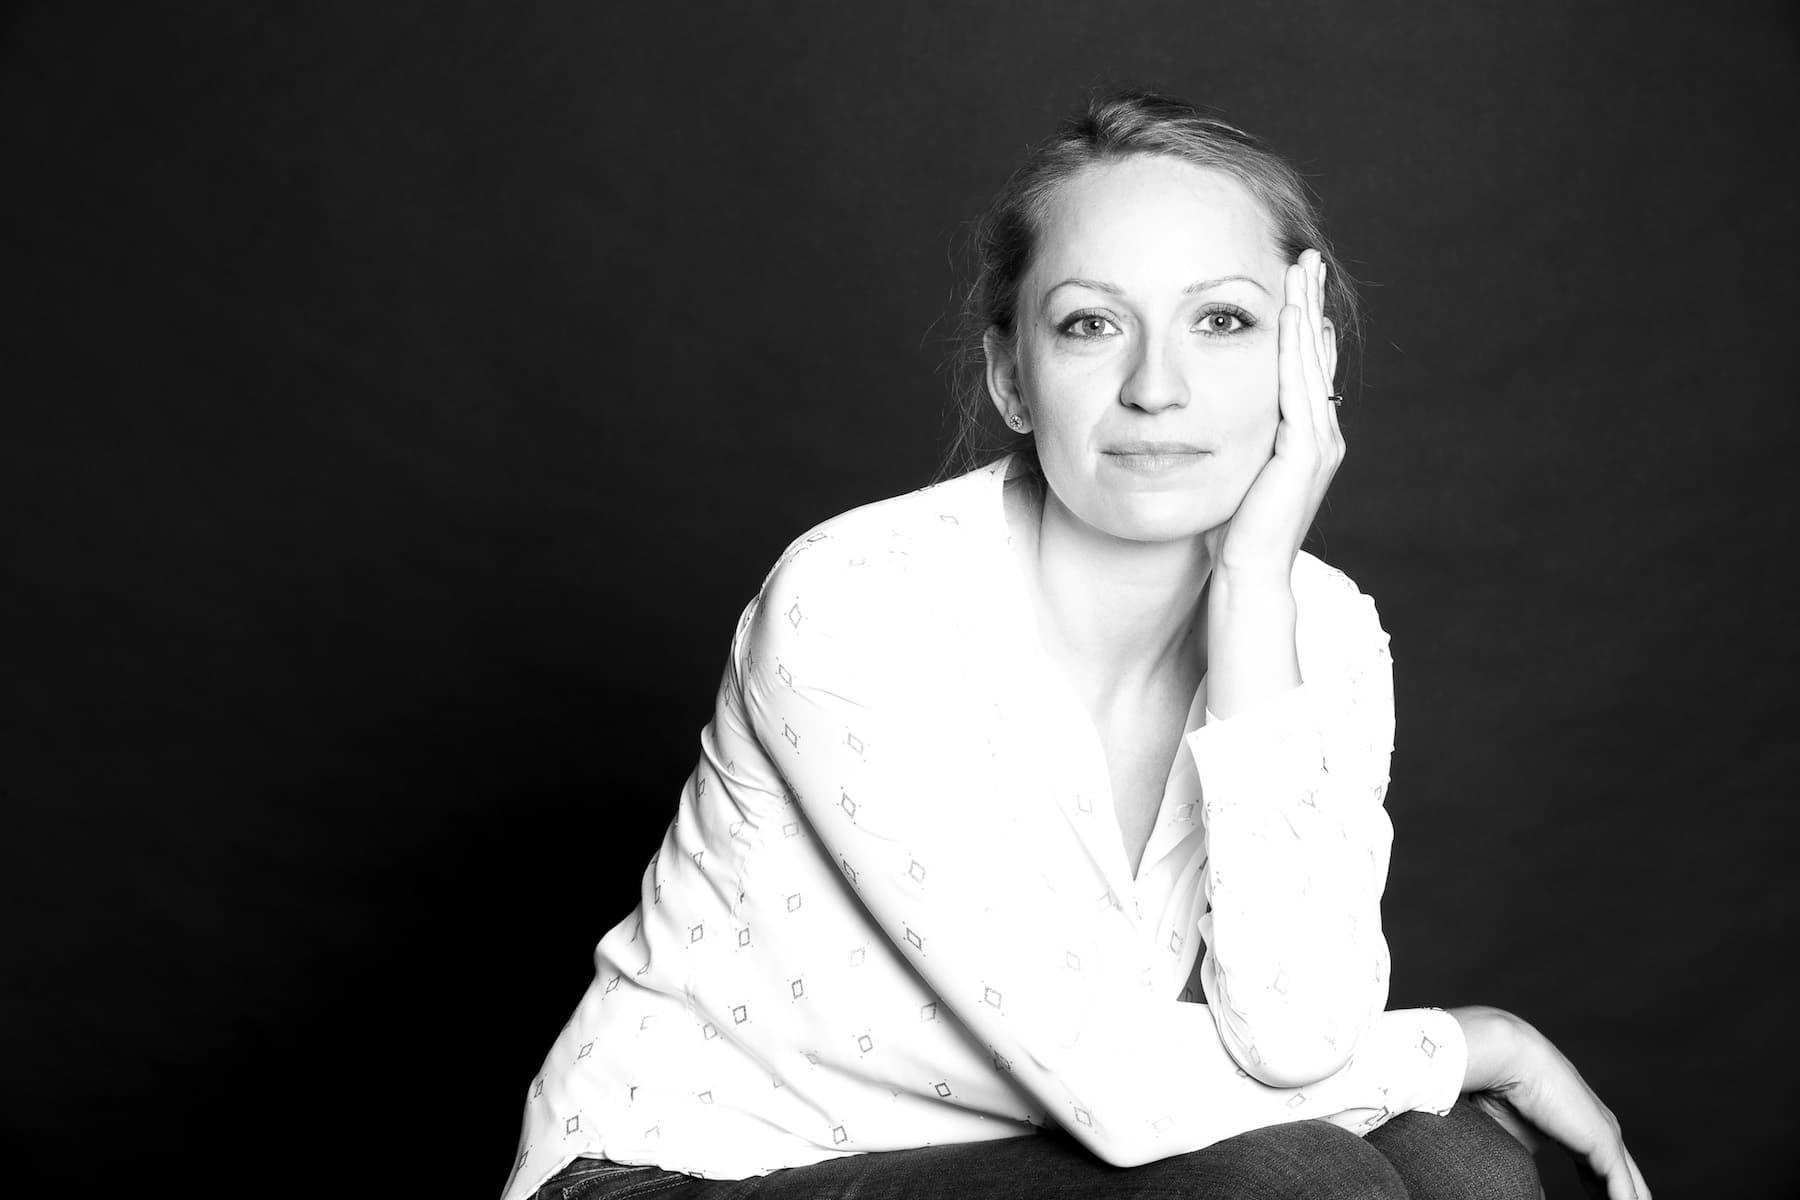 Fotoshooting Rosenheim Fotograf Stephan Franz Photography - 4